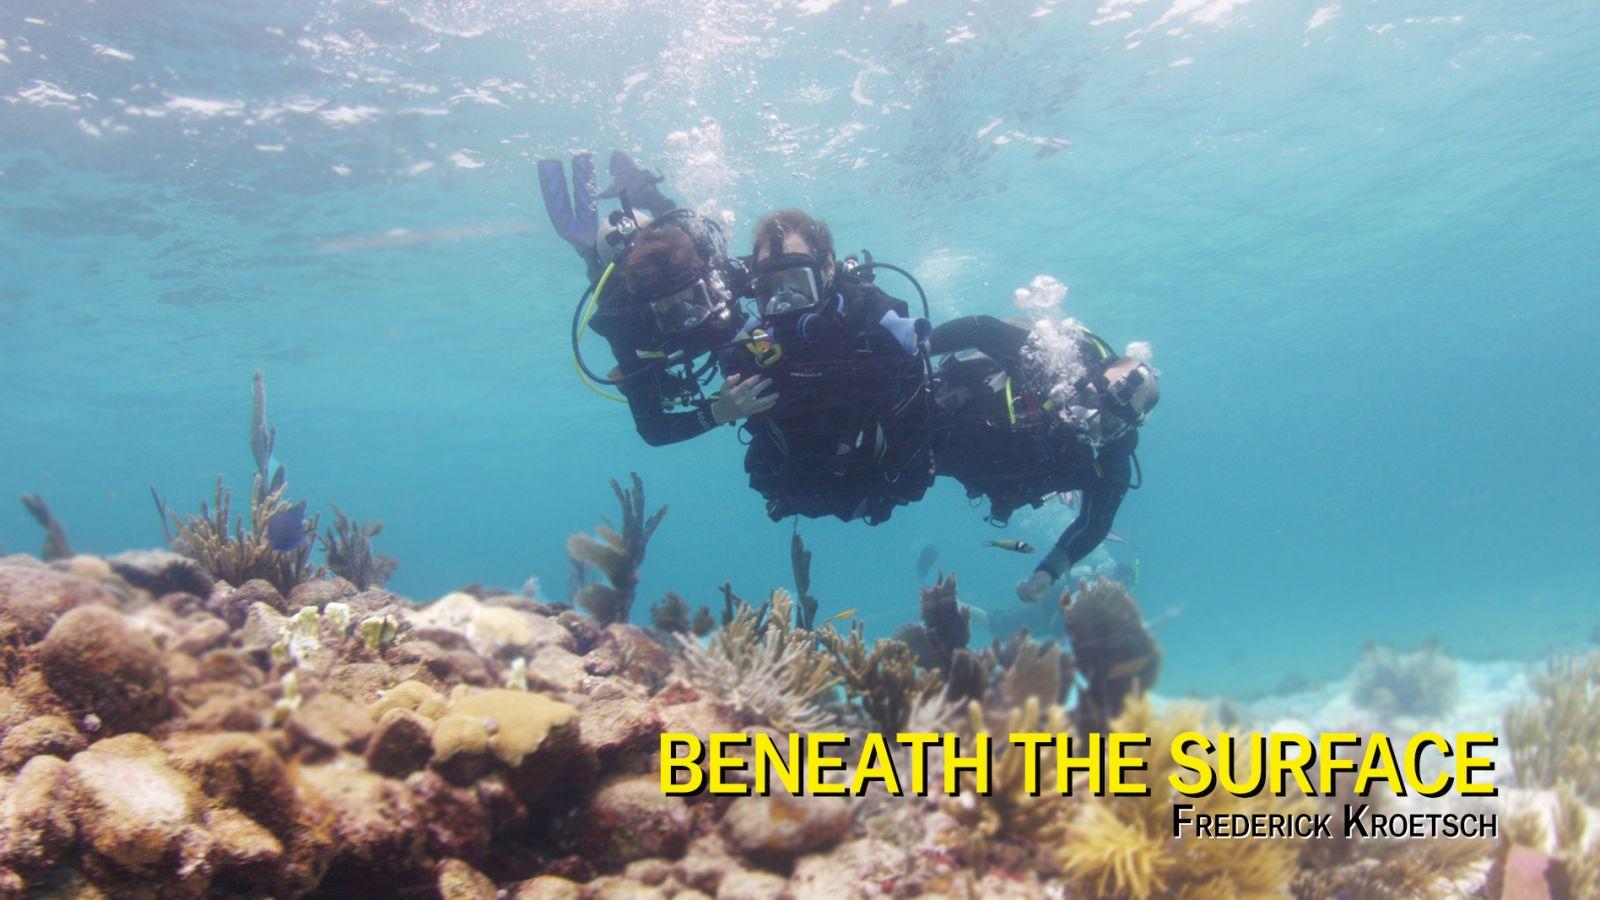 Beneath the surface, Frederick Kroetsch